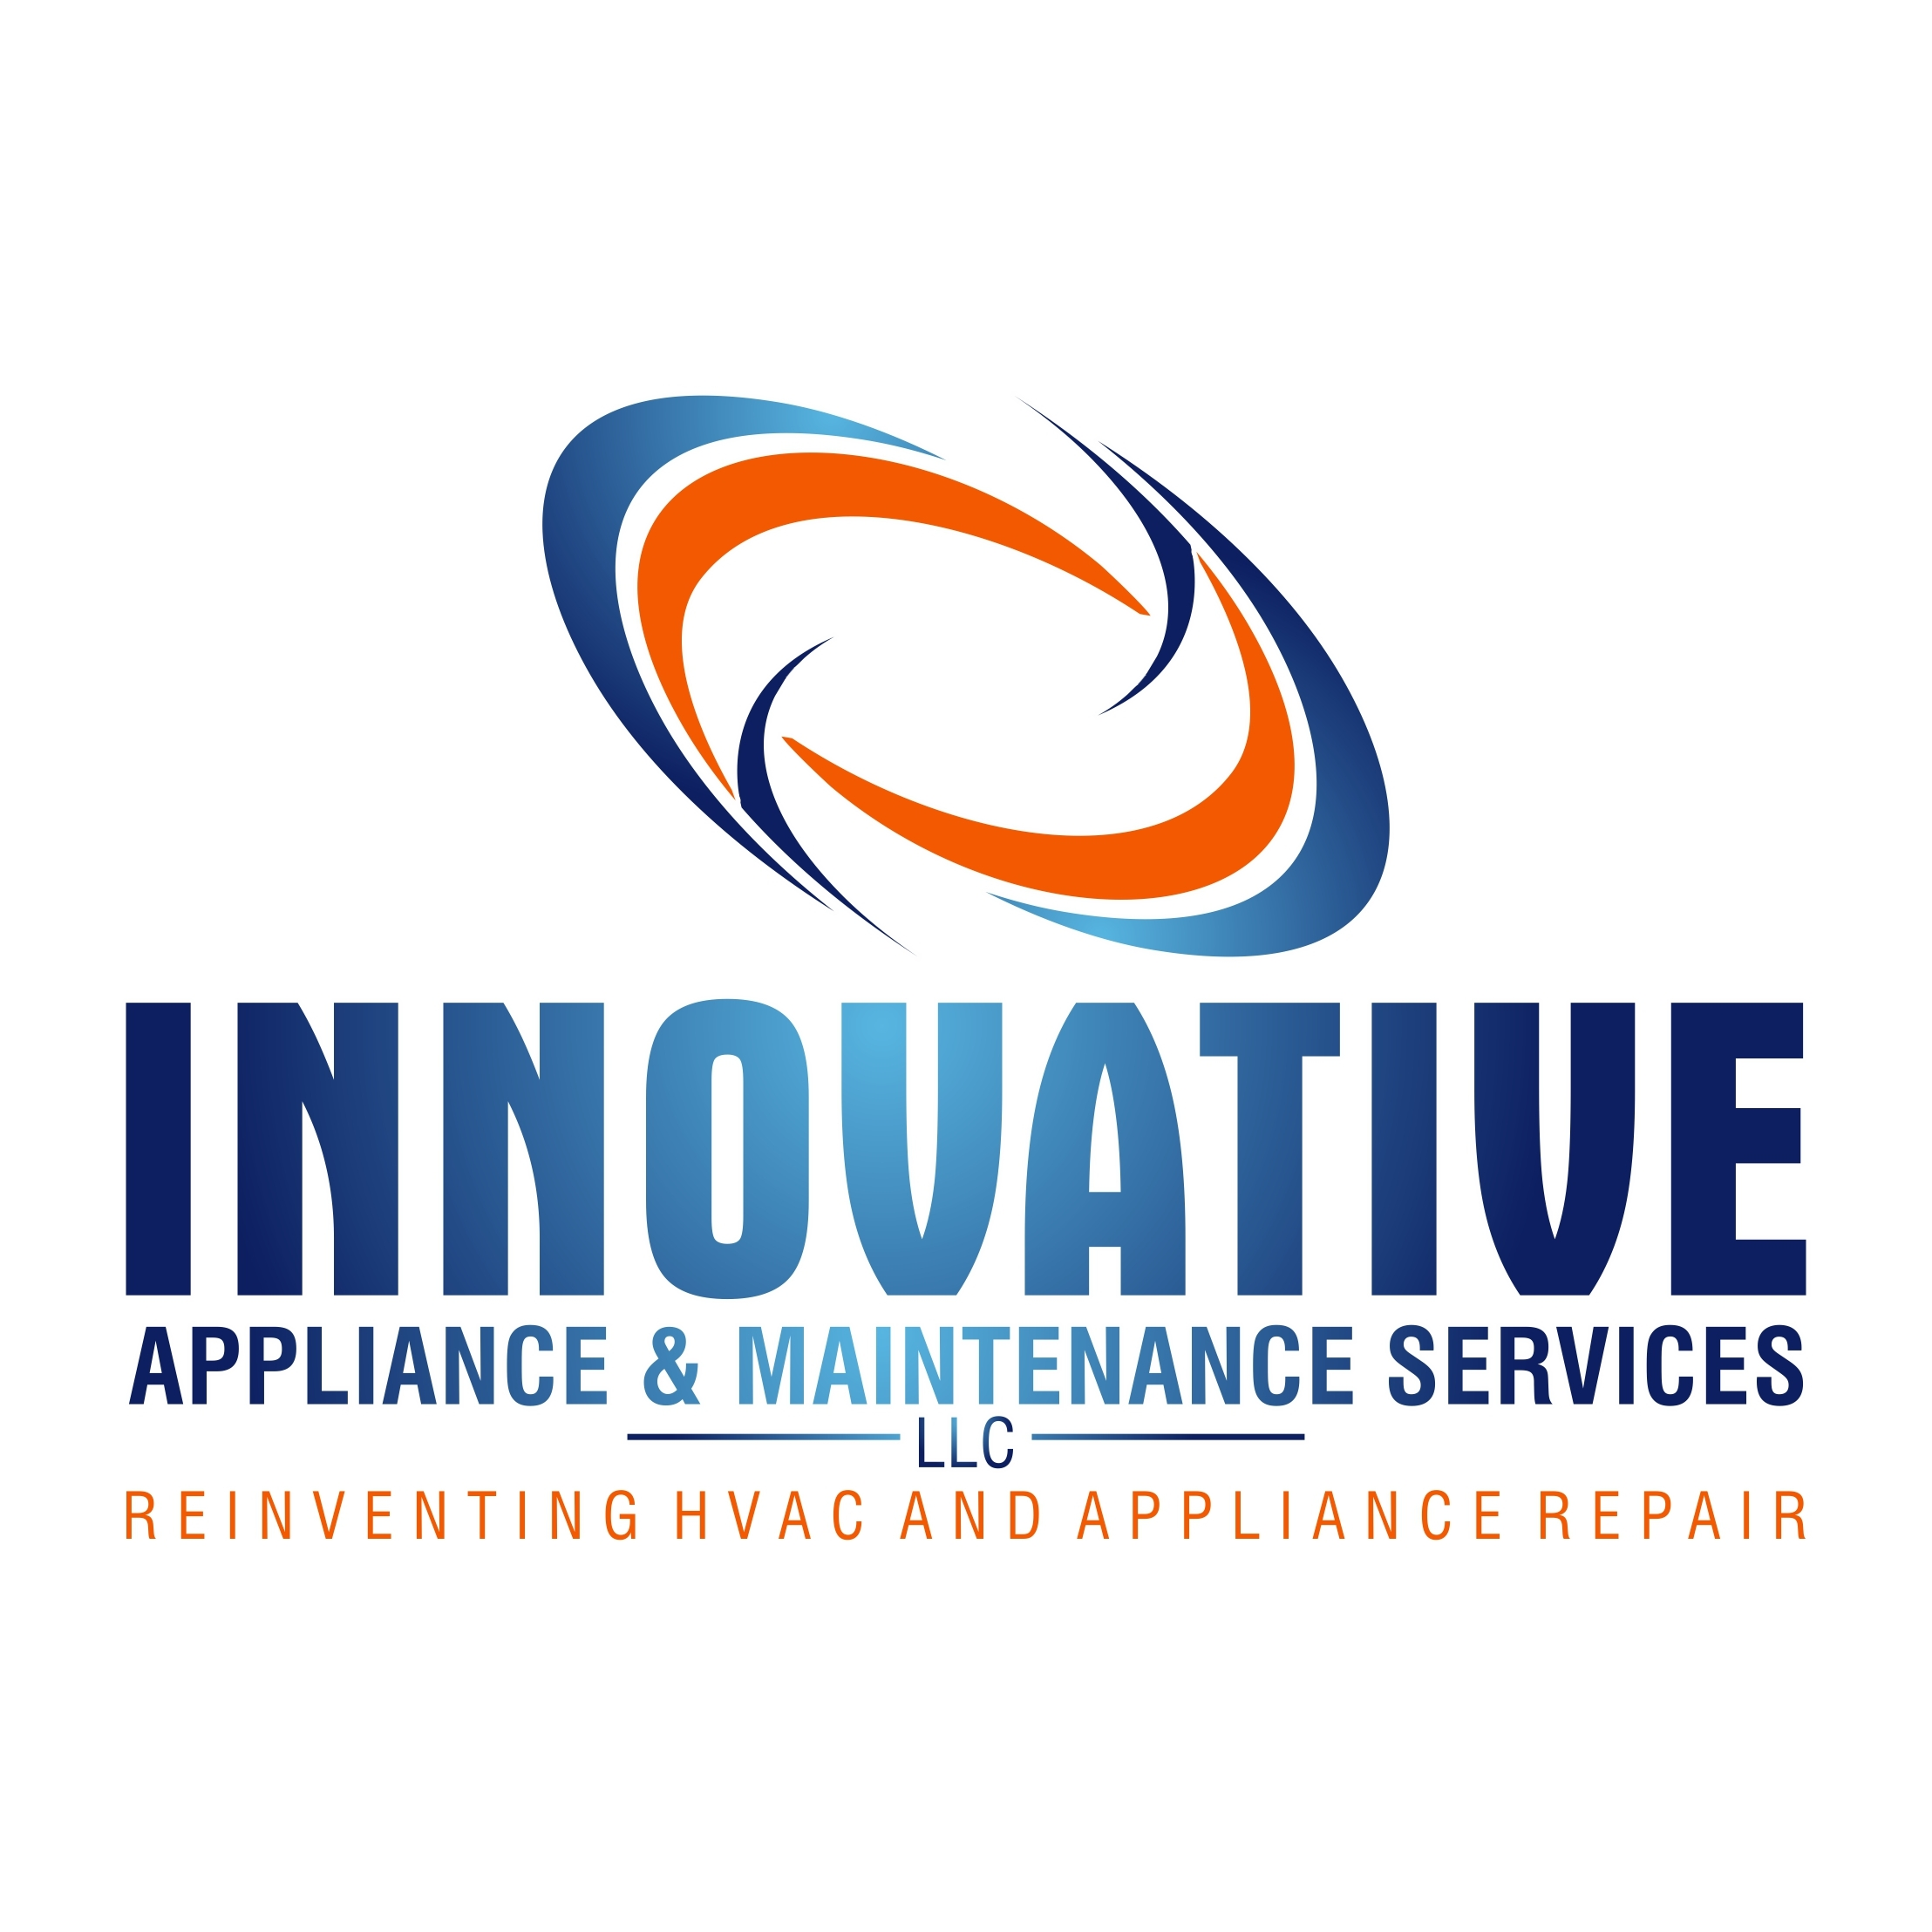 Innovative Appliance & Maintenence Services LLC